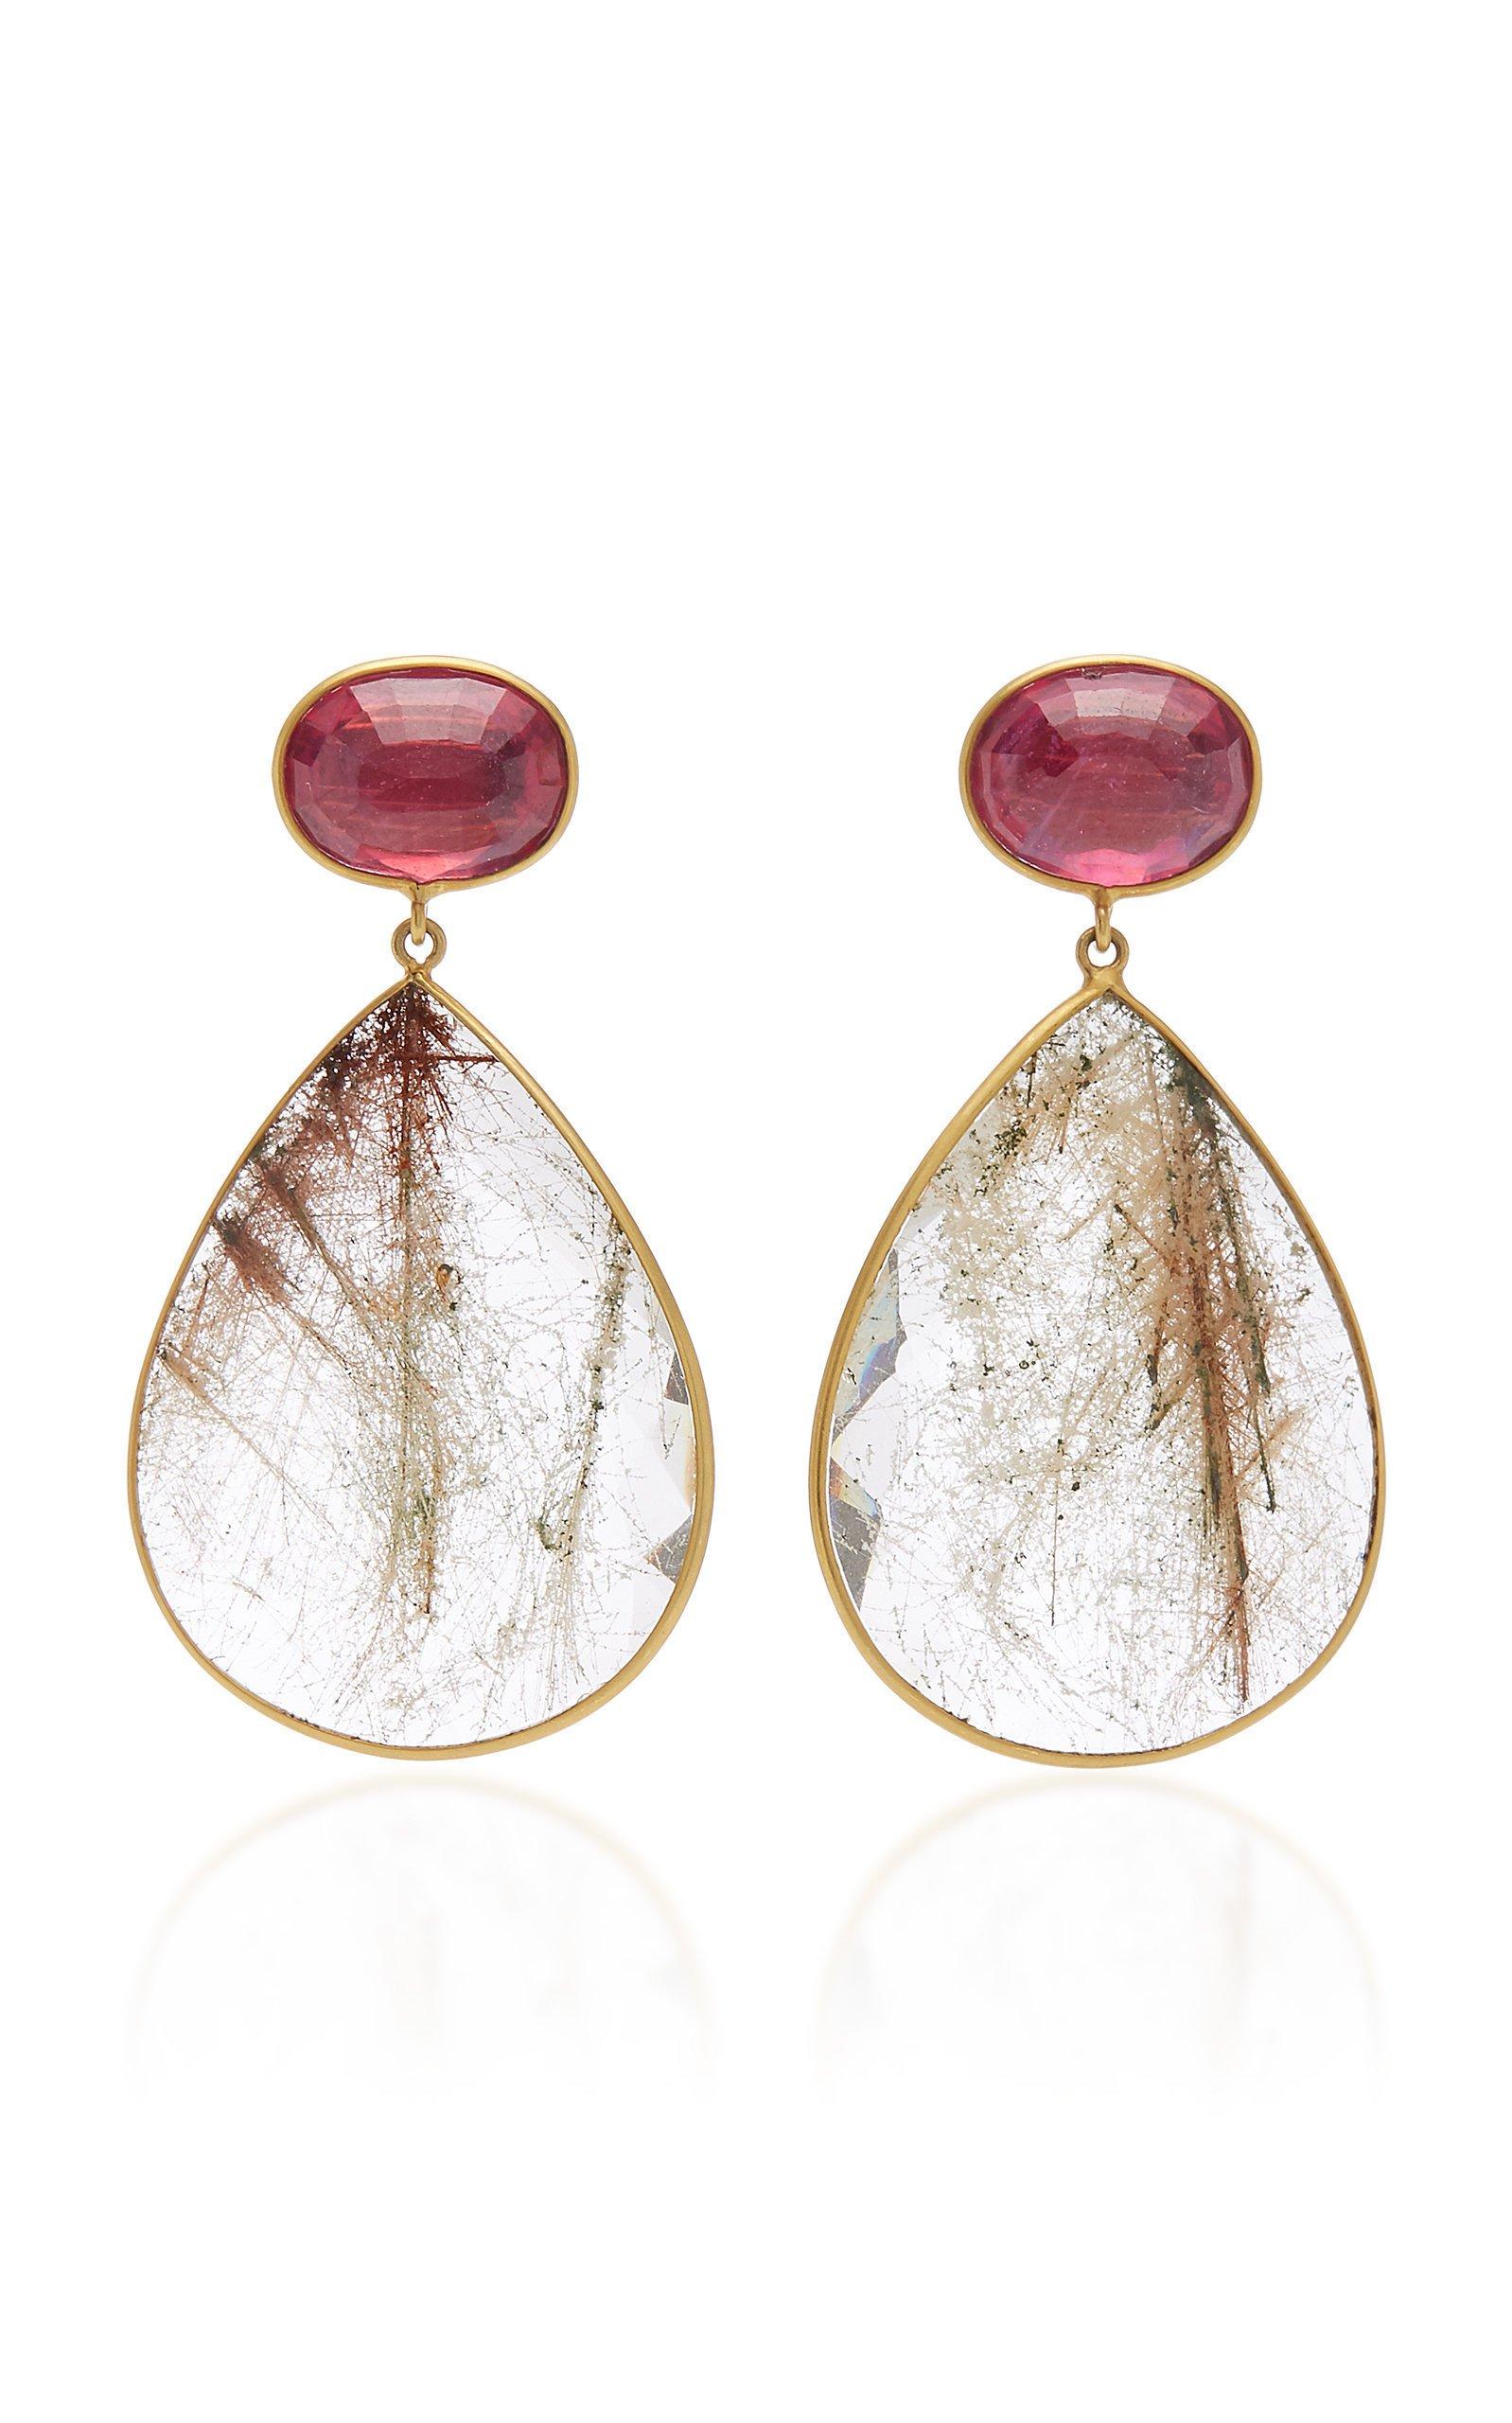 Bahina One of a Kind Ruby and Quartz Earrings